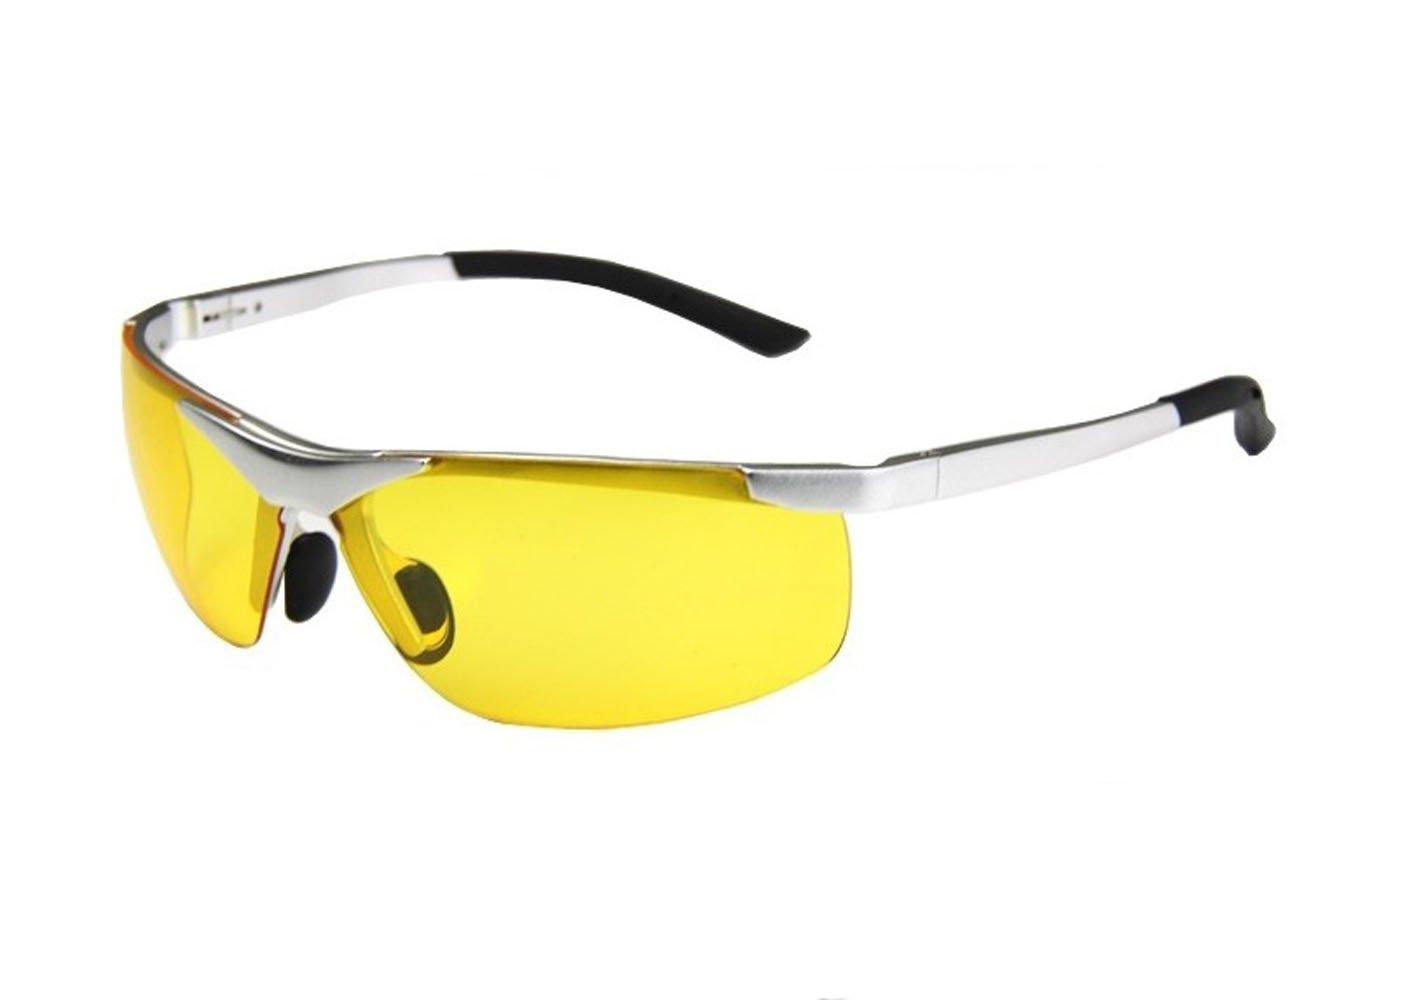 Telam Night Vision Goggles Night Vision Driving Glasses Dedicated Driving At Night Must Drive At Night